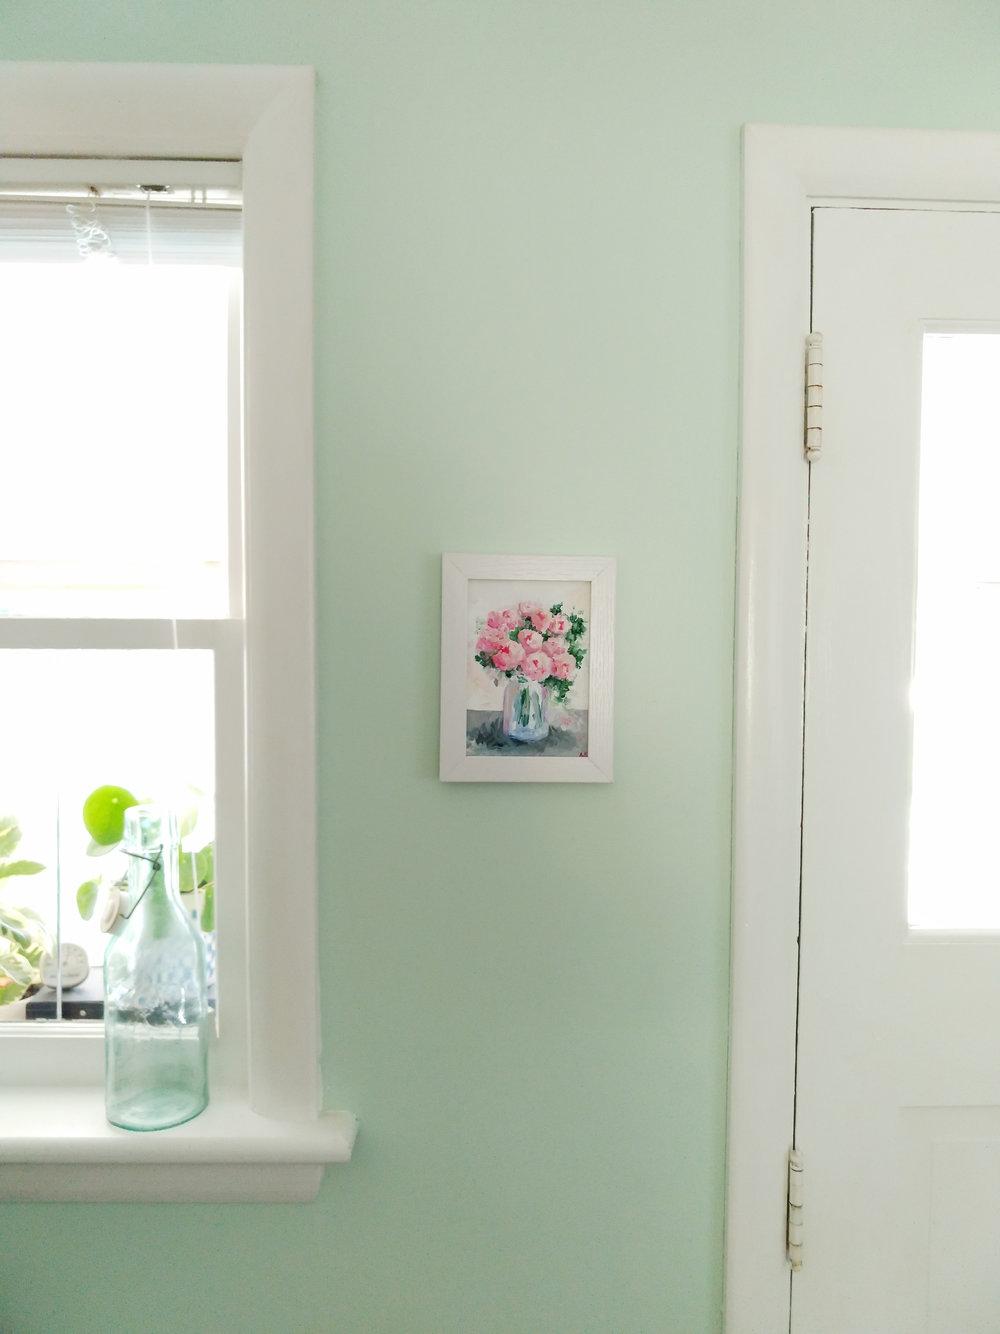 Small 5 x7 Original Framed Peony Painting by Amanda Farquharson